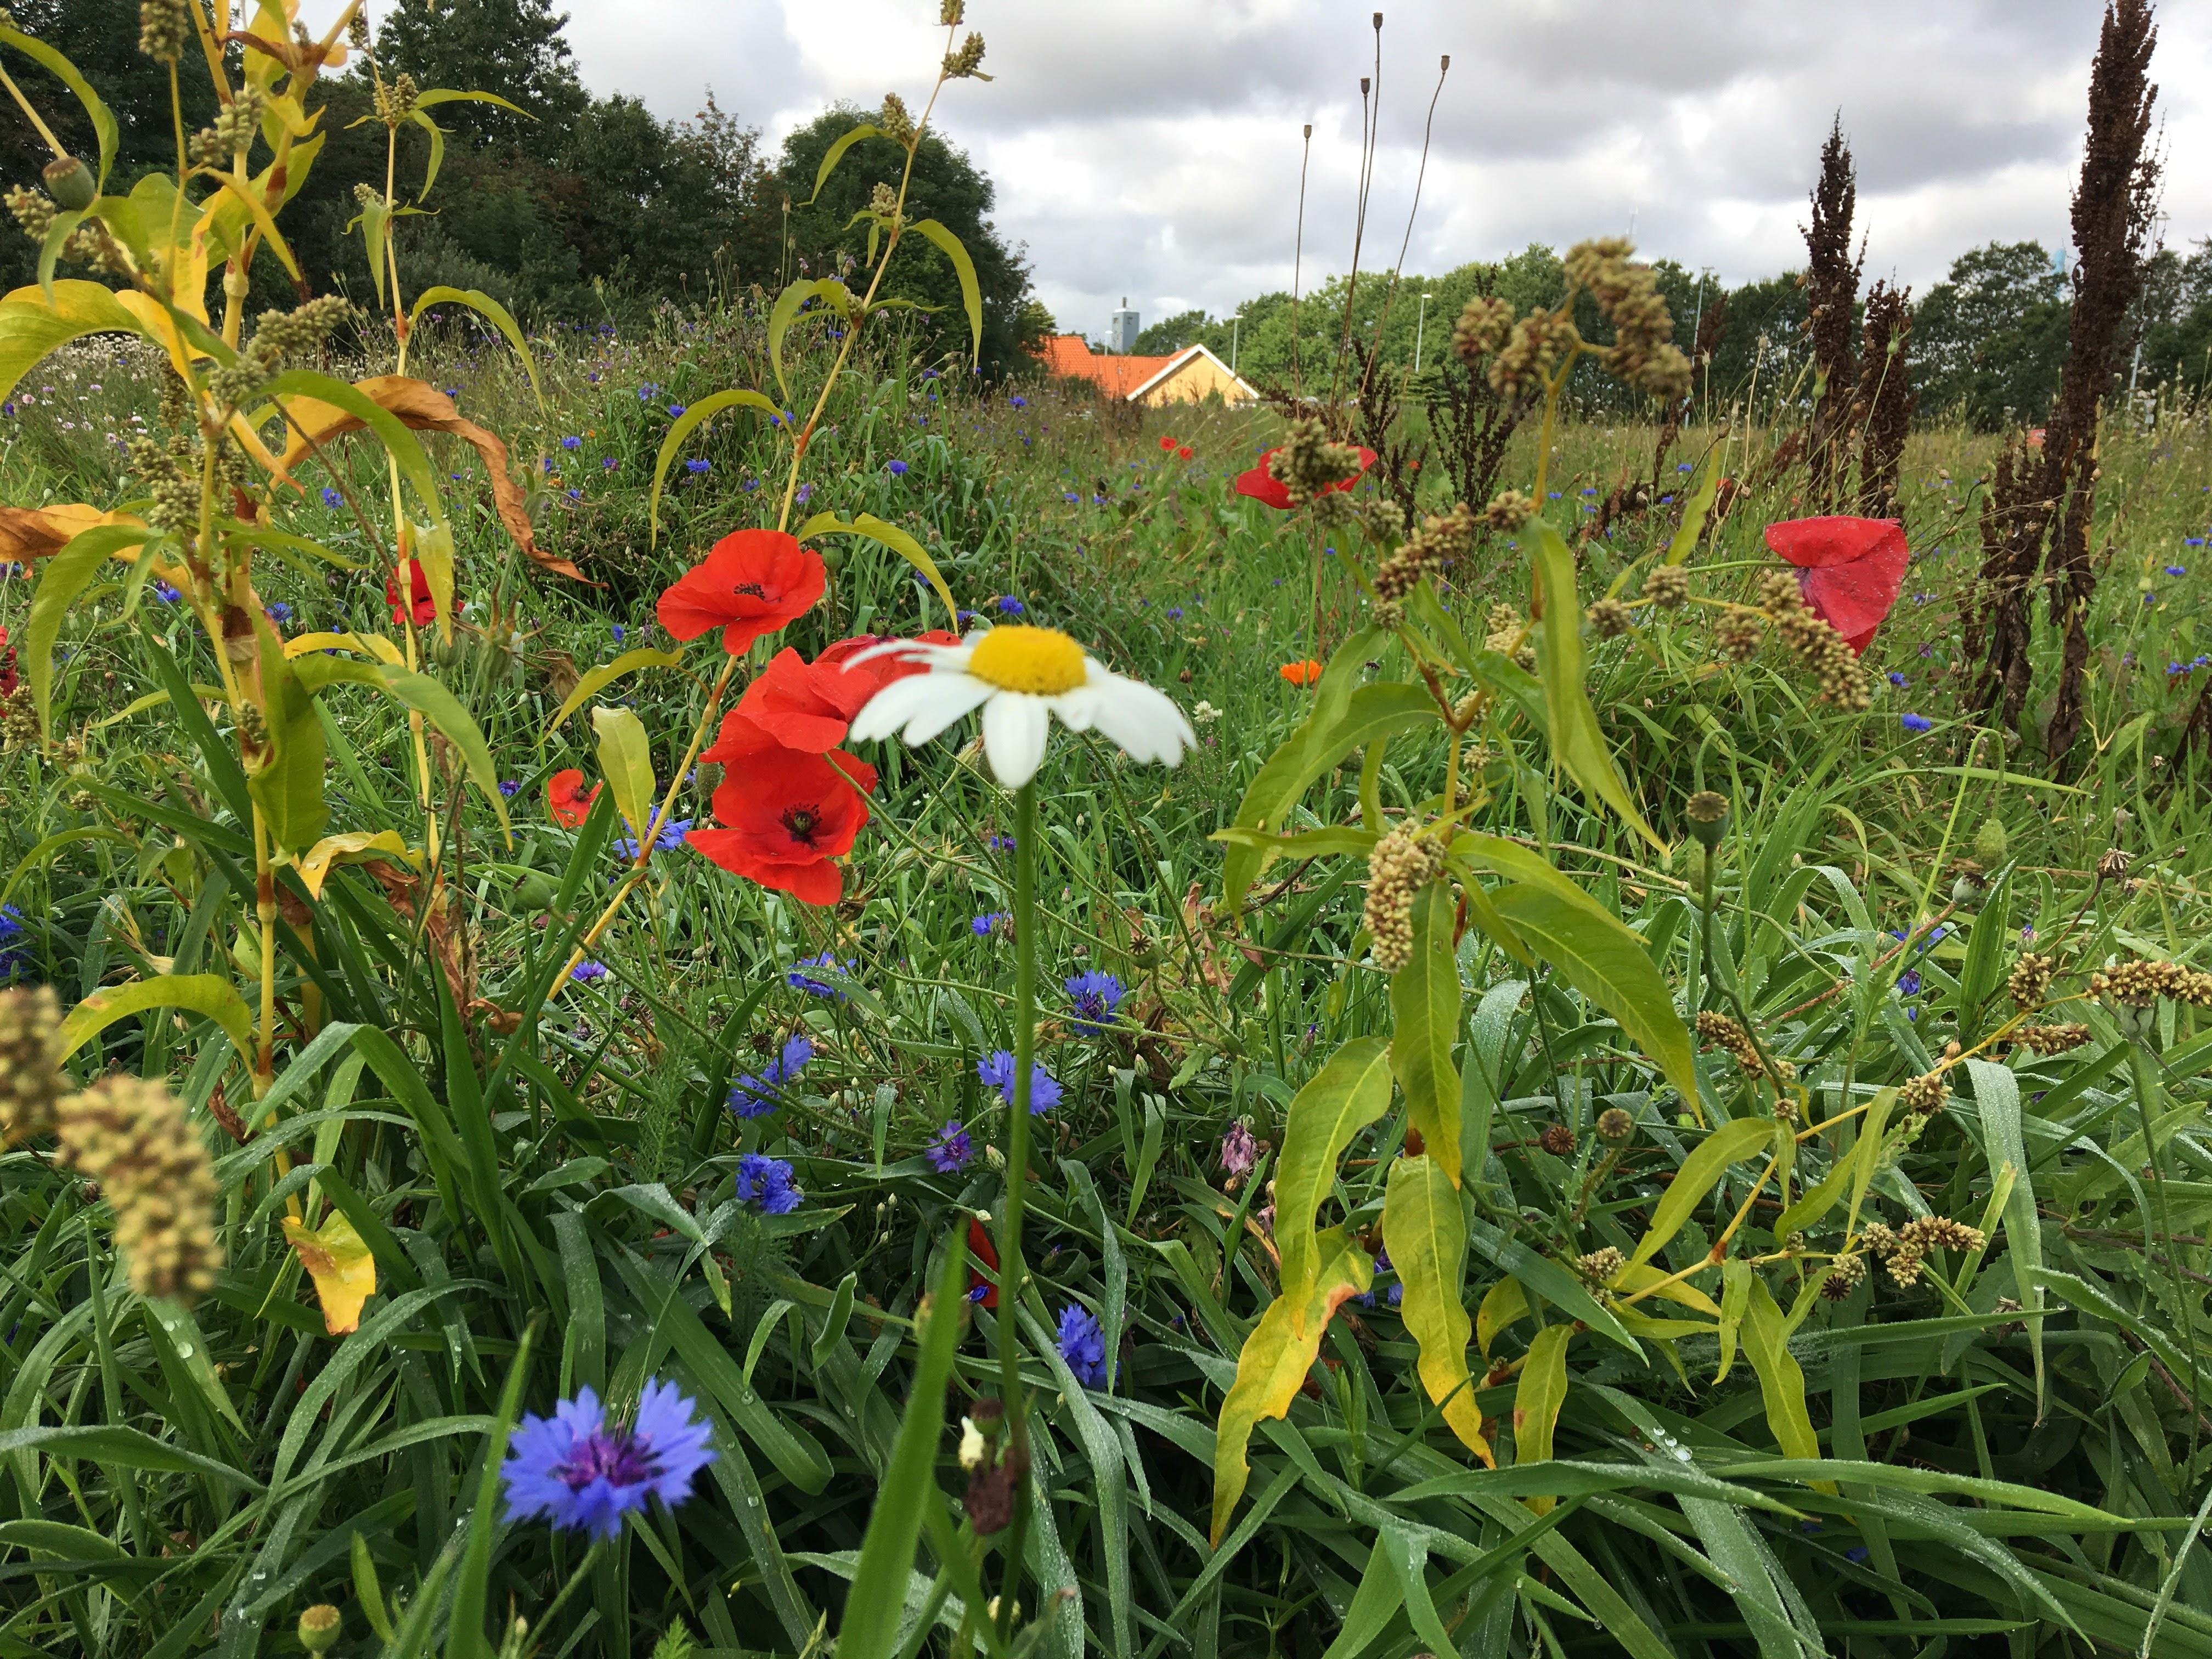 Kommuner planter vildere natur til insekter